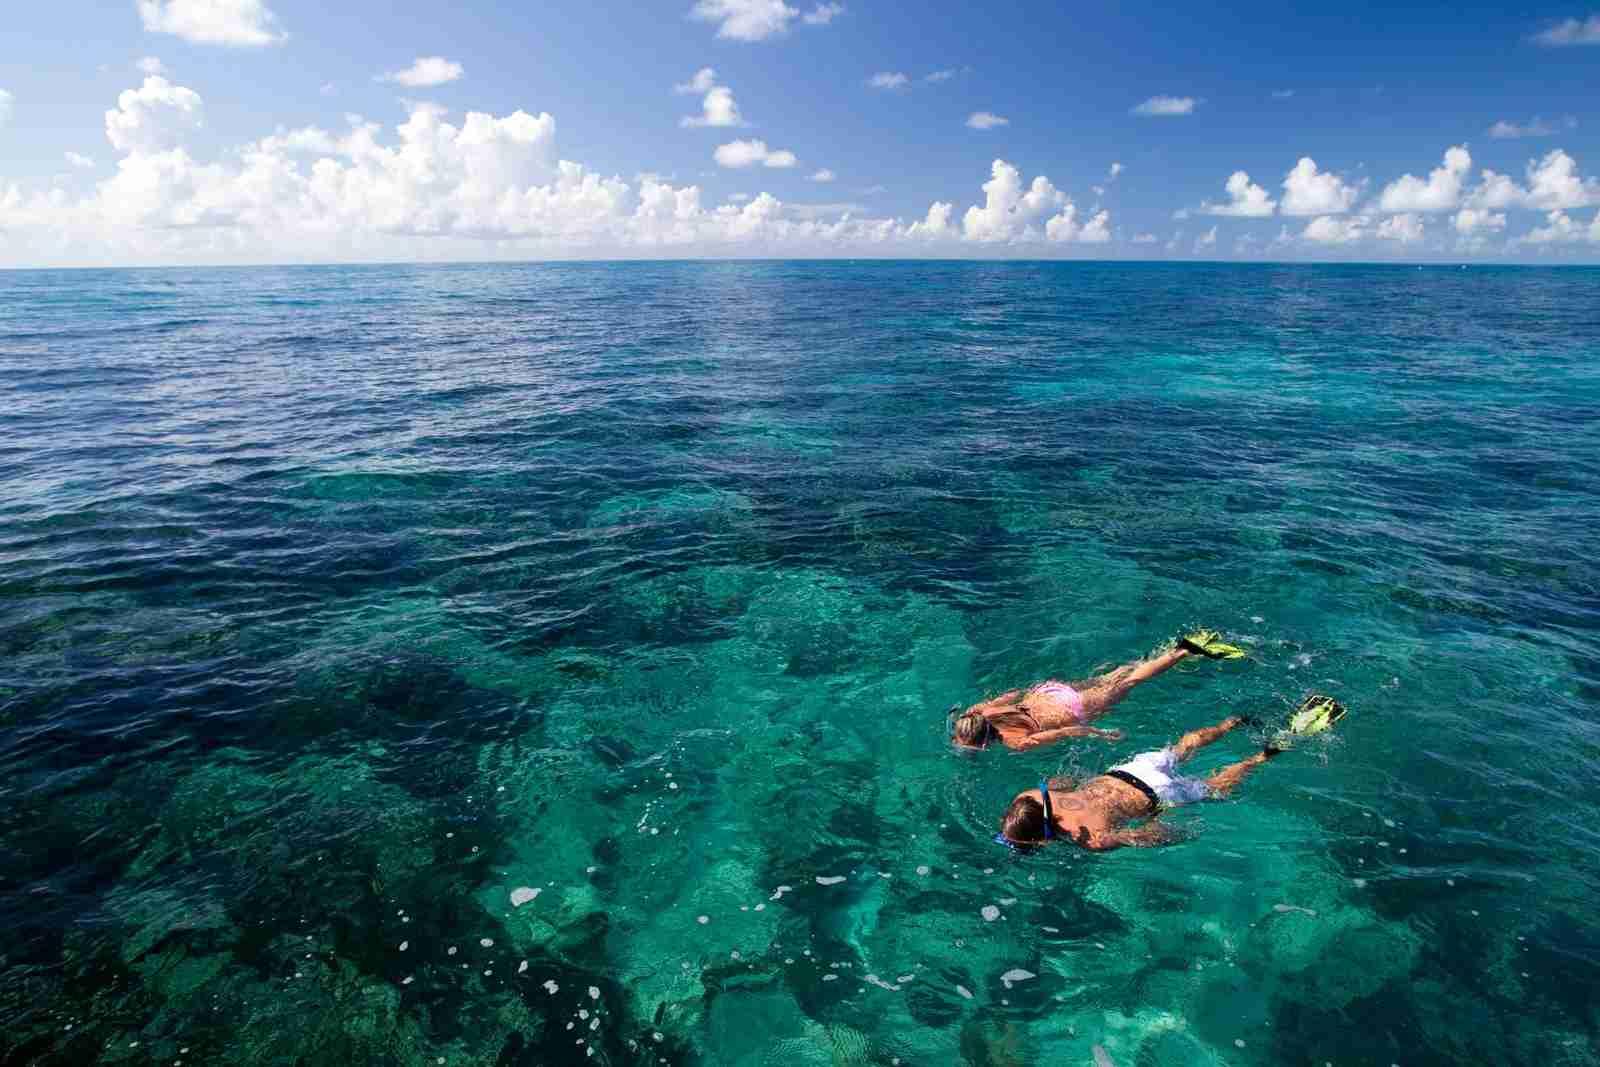 Key Largo and the Florida Keys National Marine Sanctuary. (Photo by Stephen Frink/Getty Images)